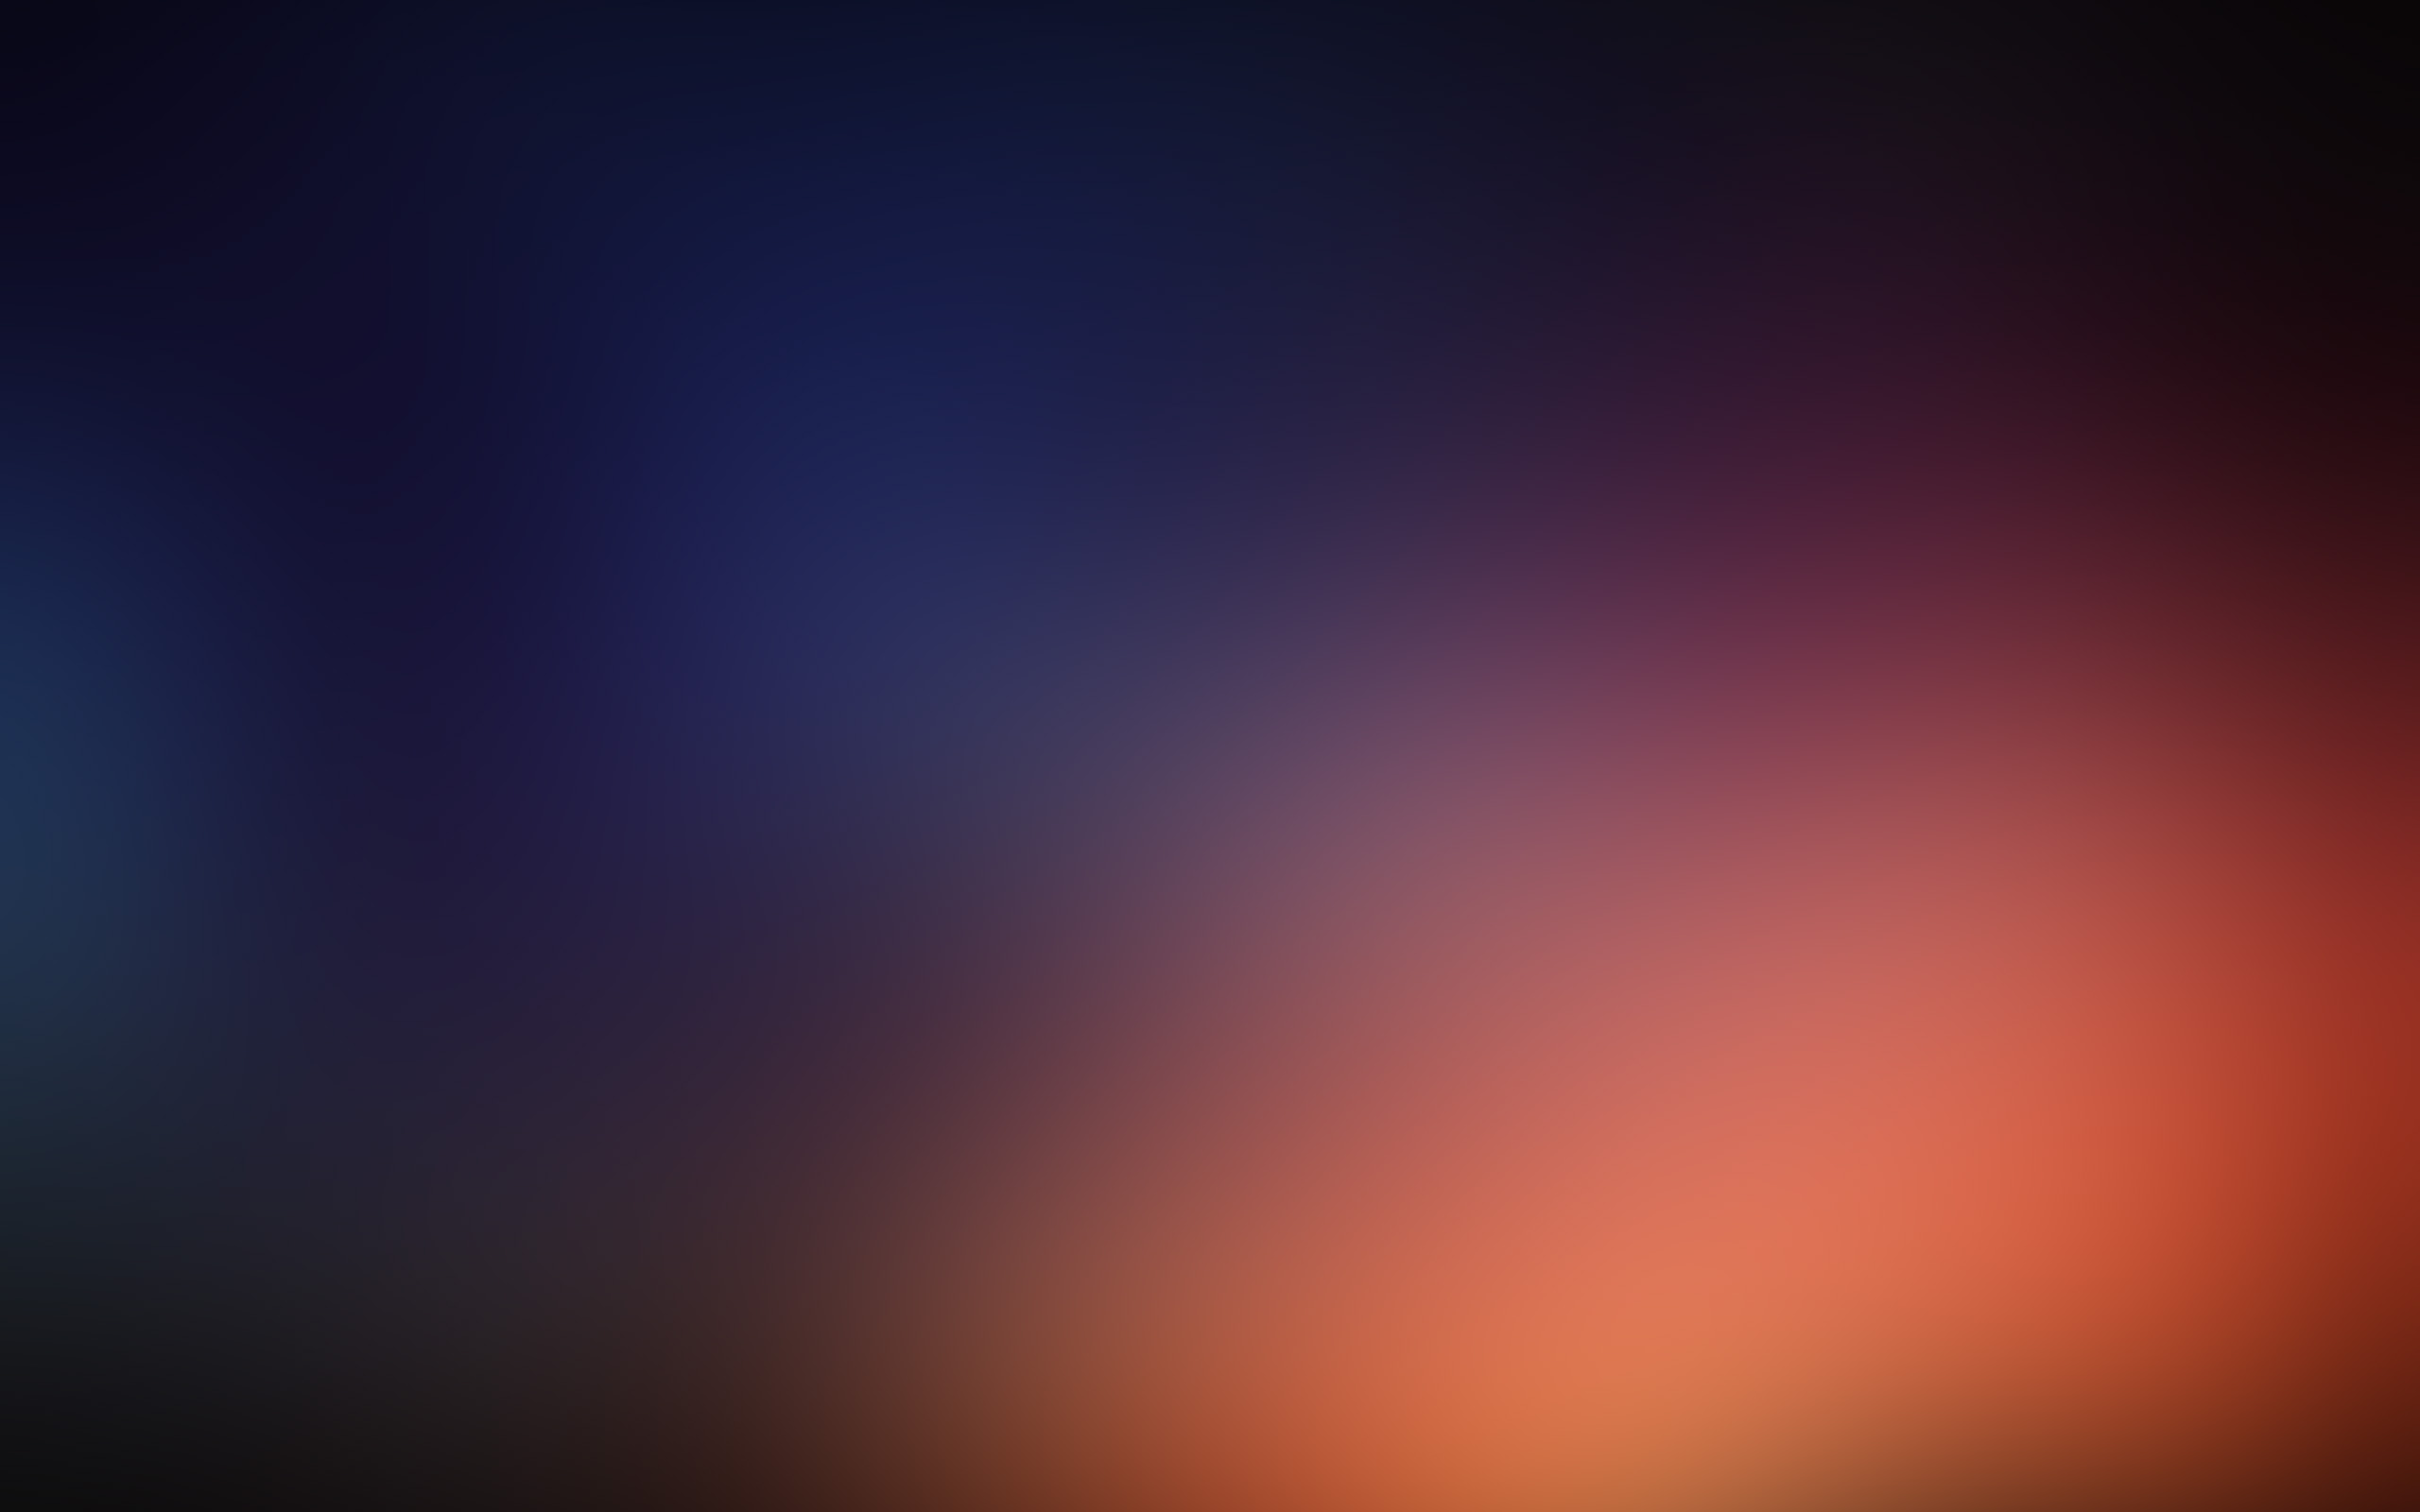 Wallpaper for desktop laptop si28 aurora blur rainbow - Color gradation wallpaper ...